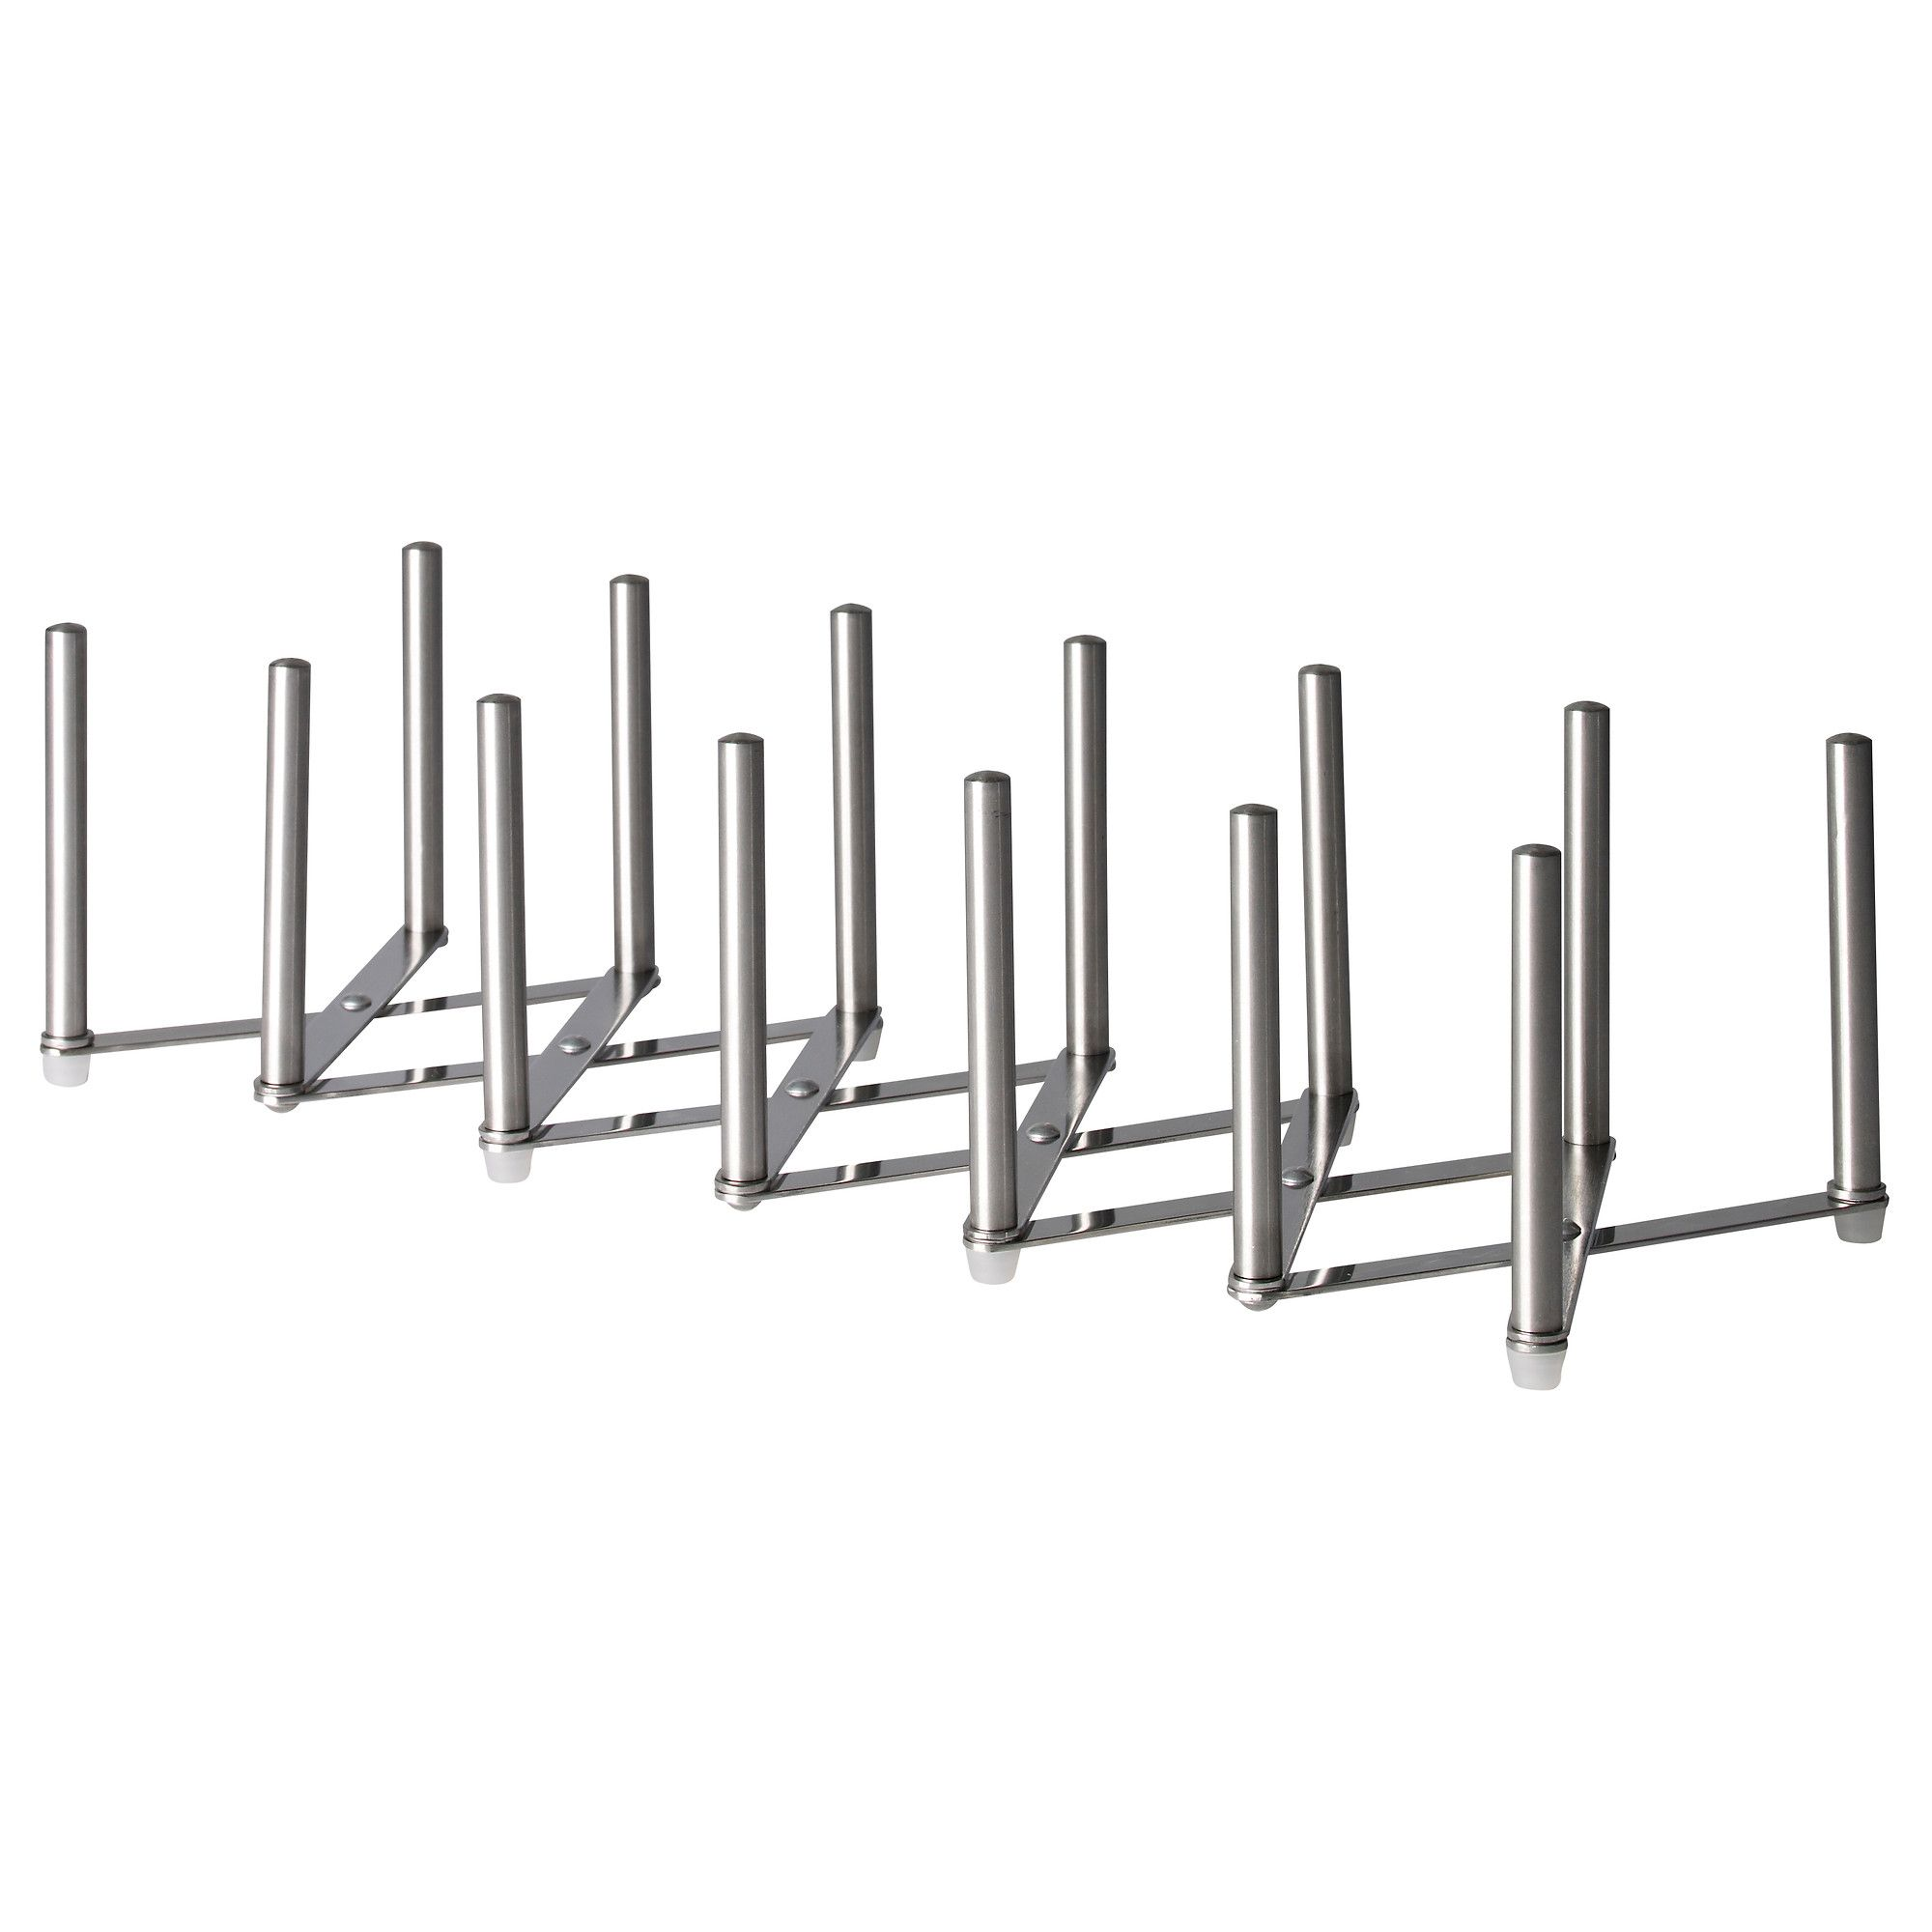 VARIERA Pot lid organizer, stainless steel IKEA   Pot lid